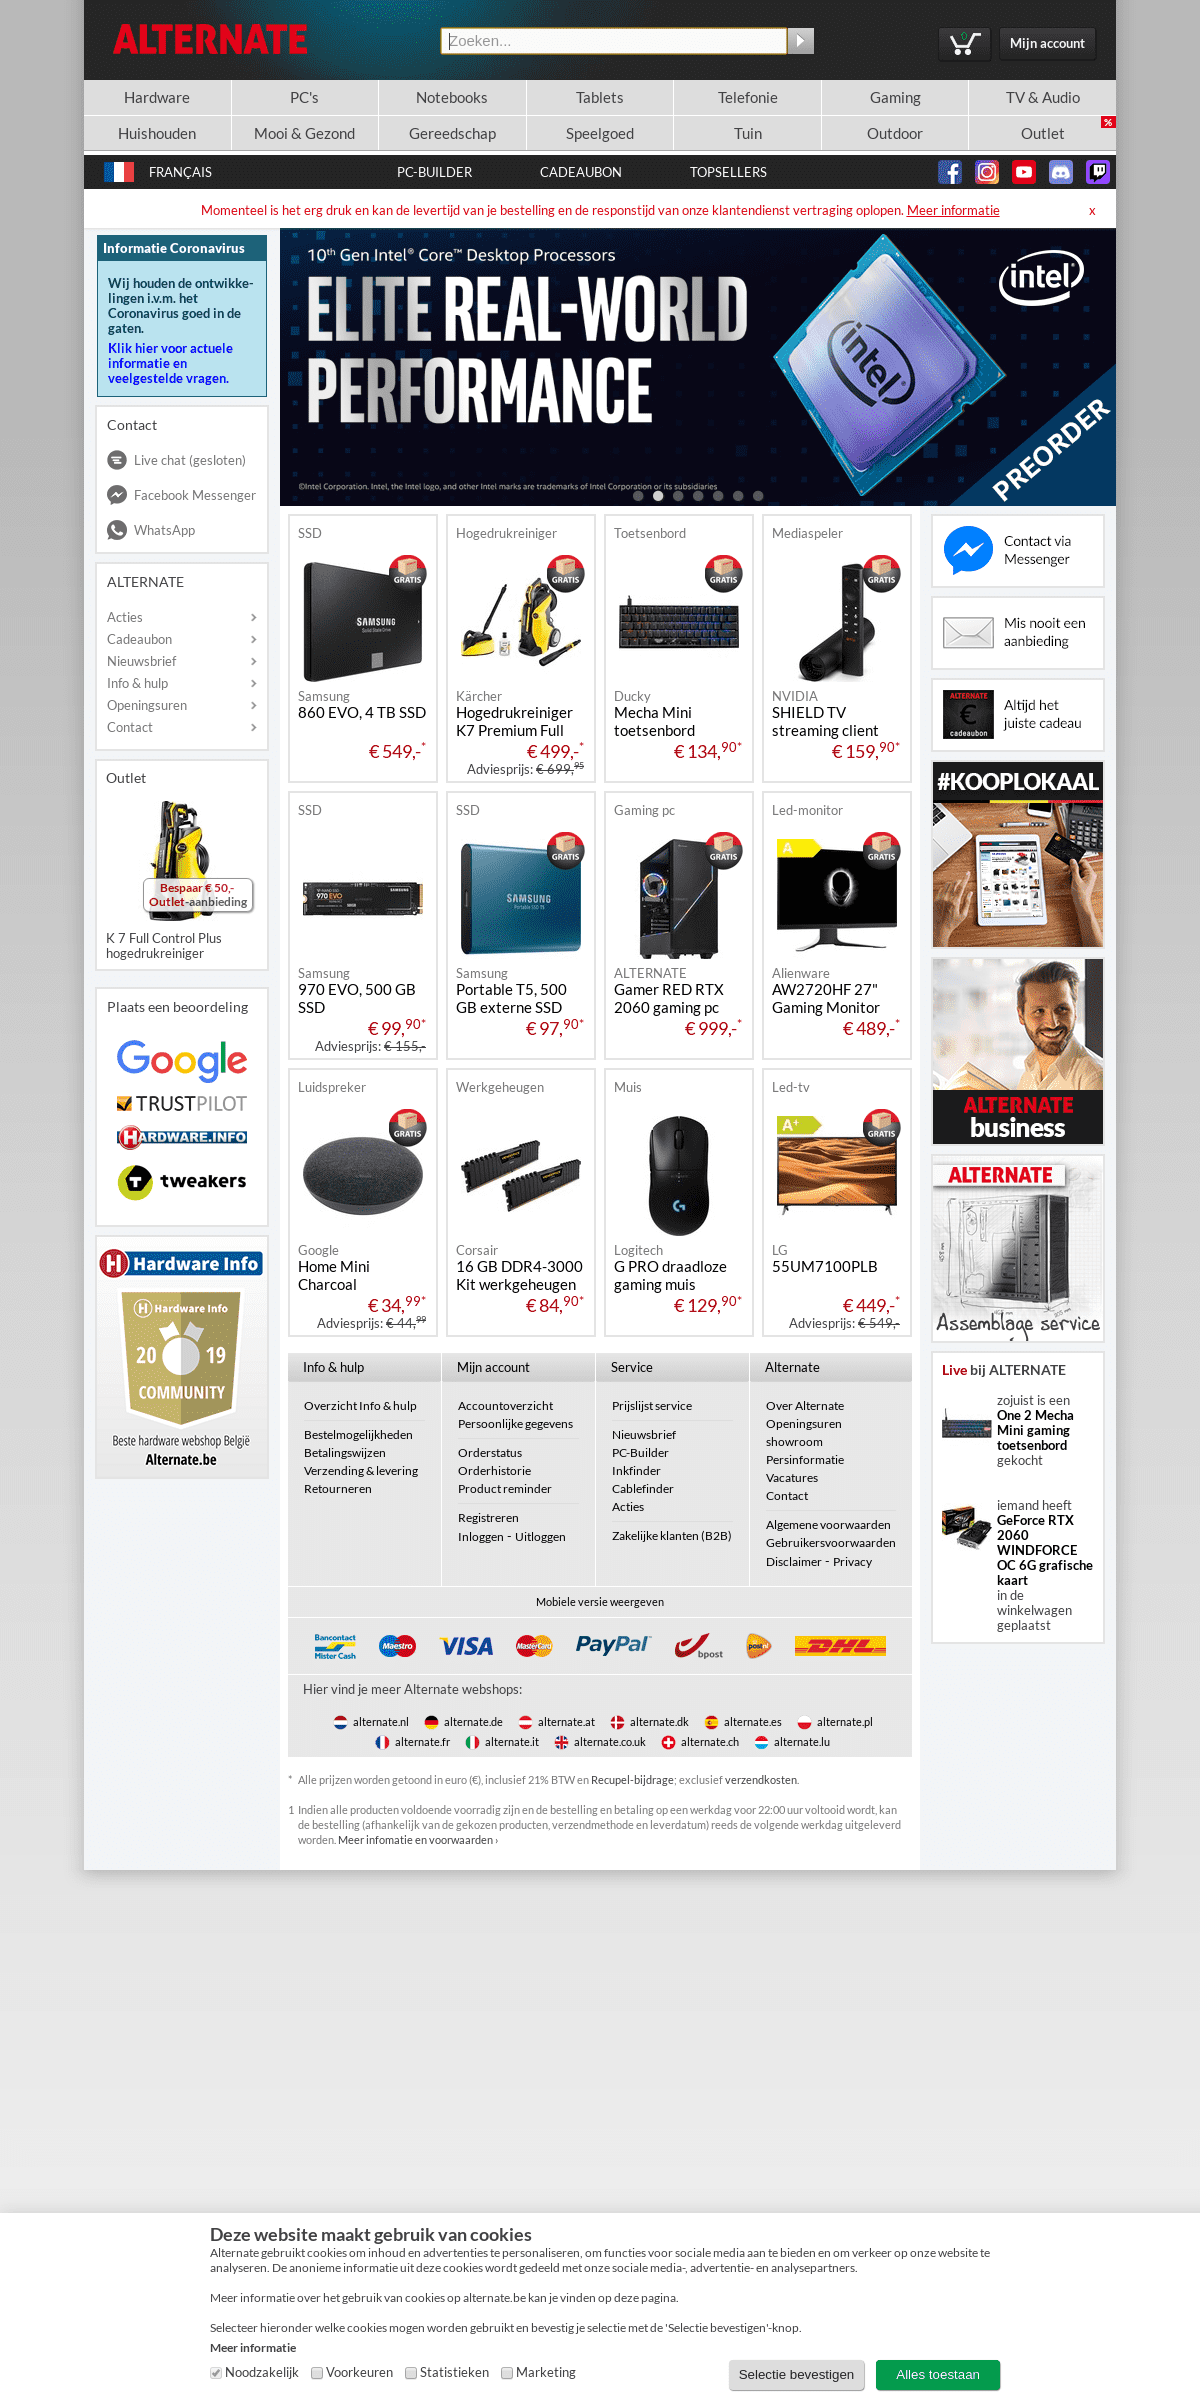 ALTERNATE - dé online computer en elektronica specialist!